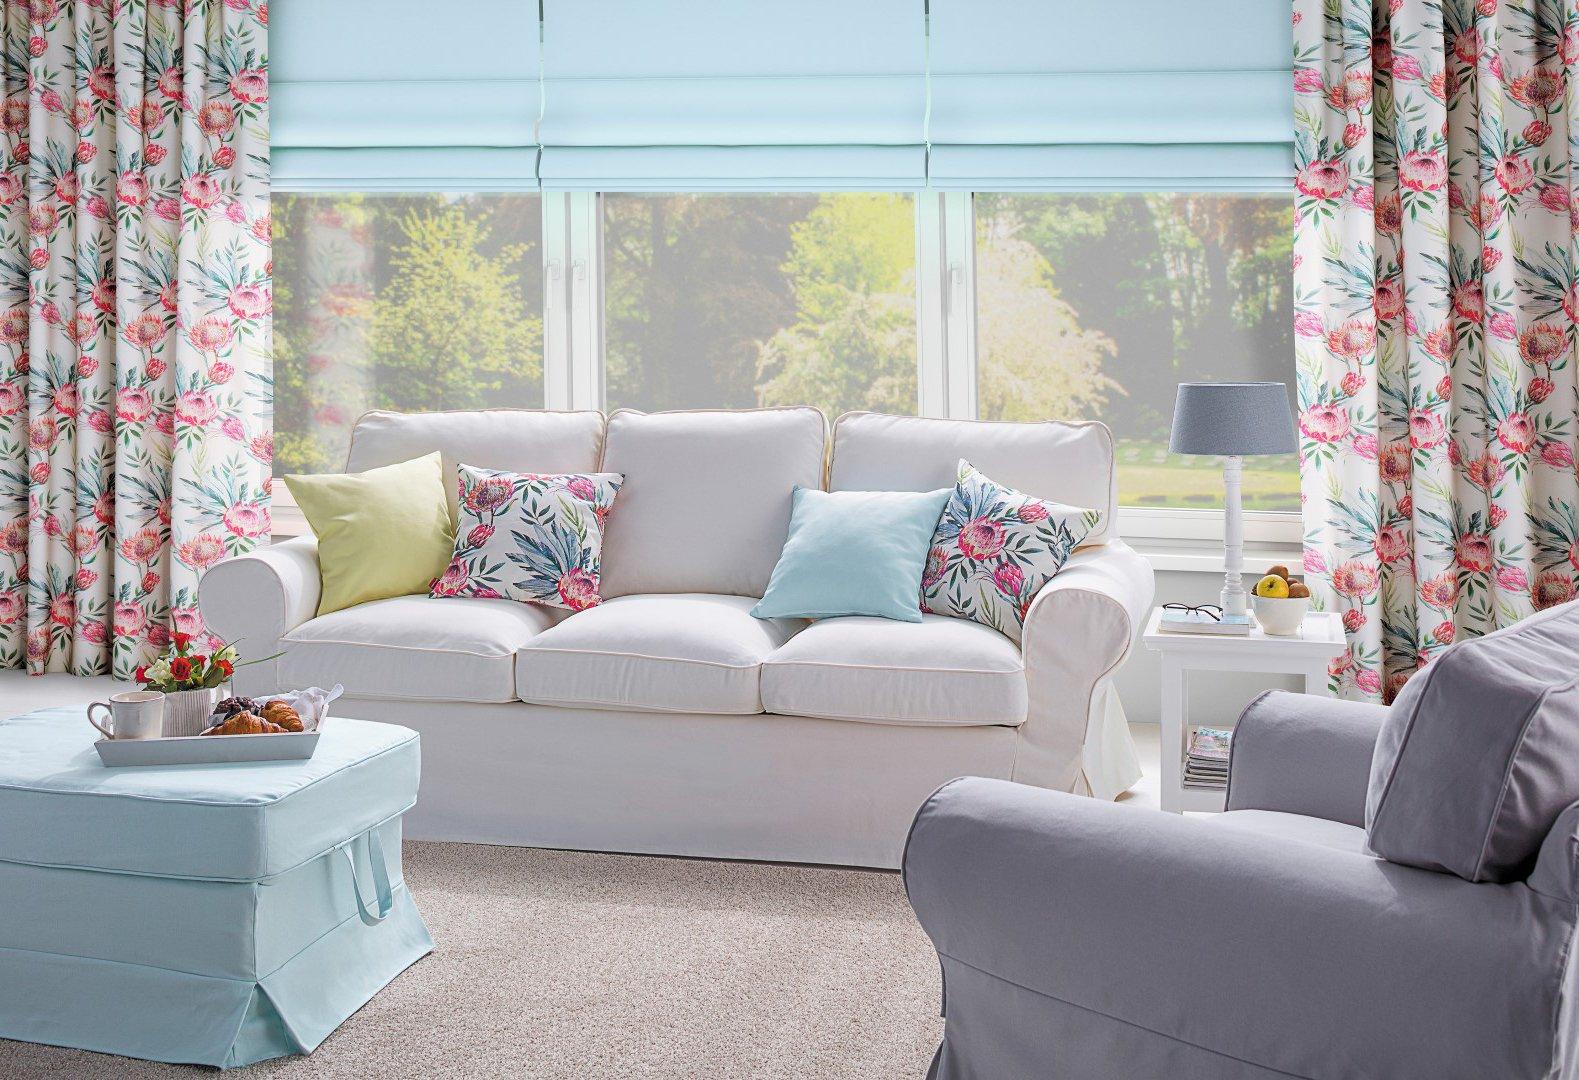 Frühlingshaftes Wohnzimmer